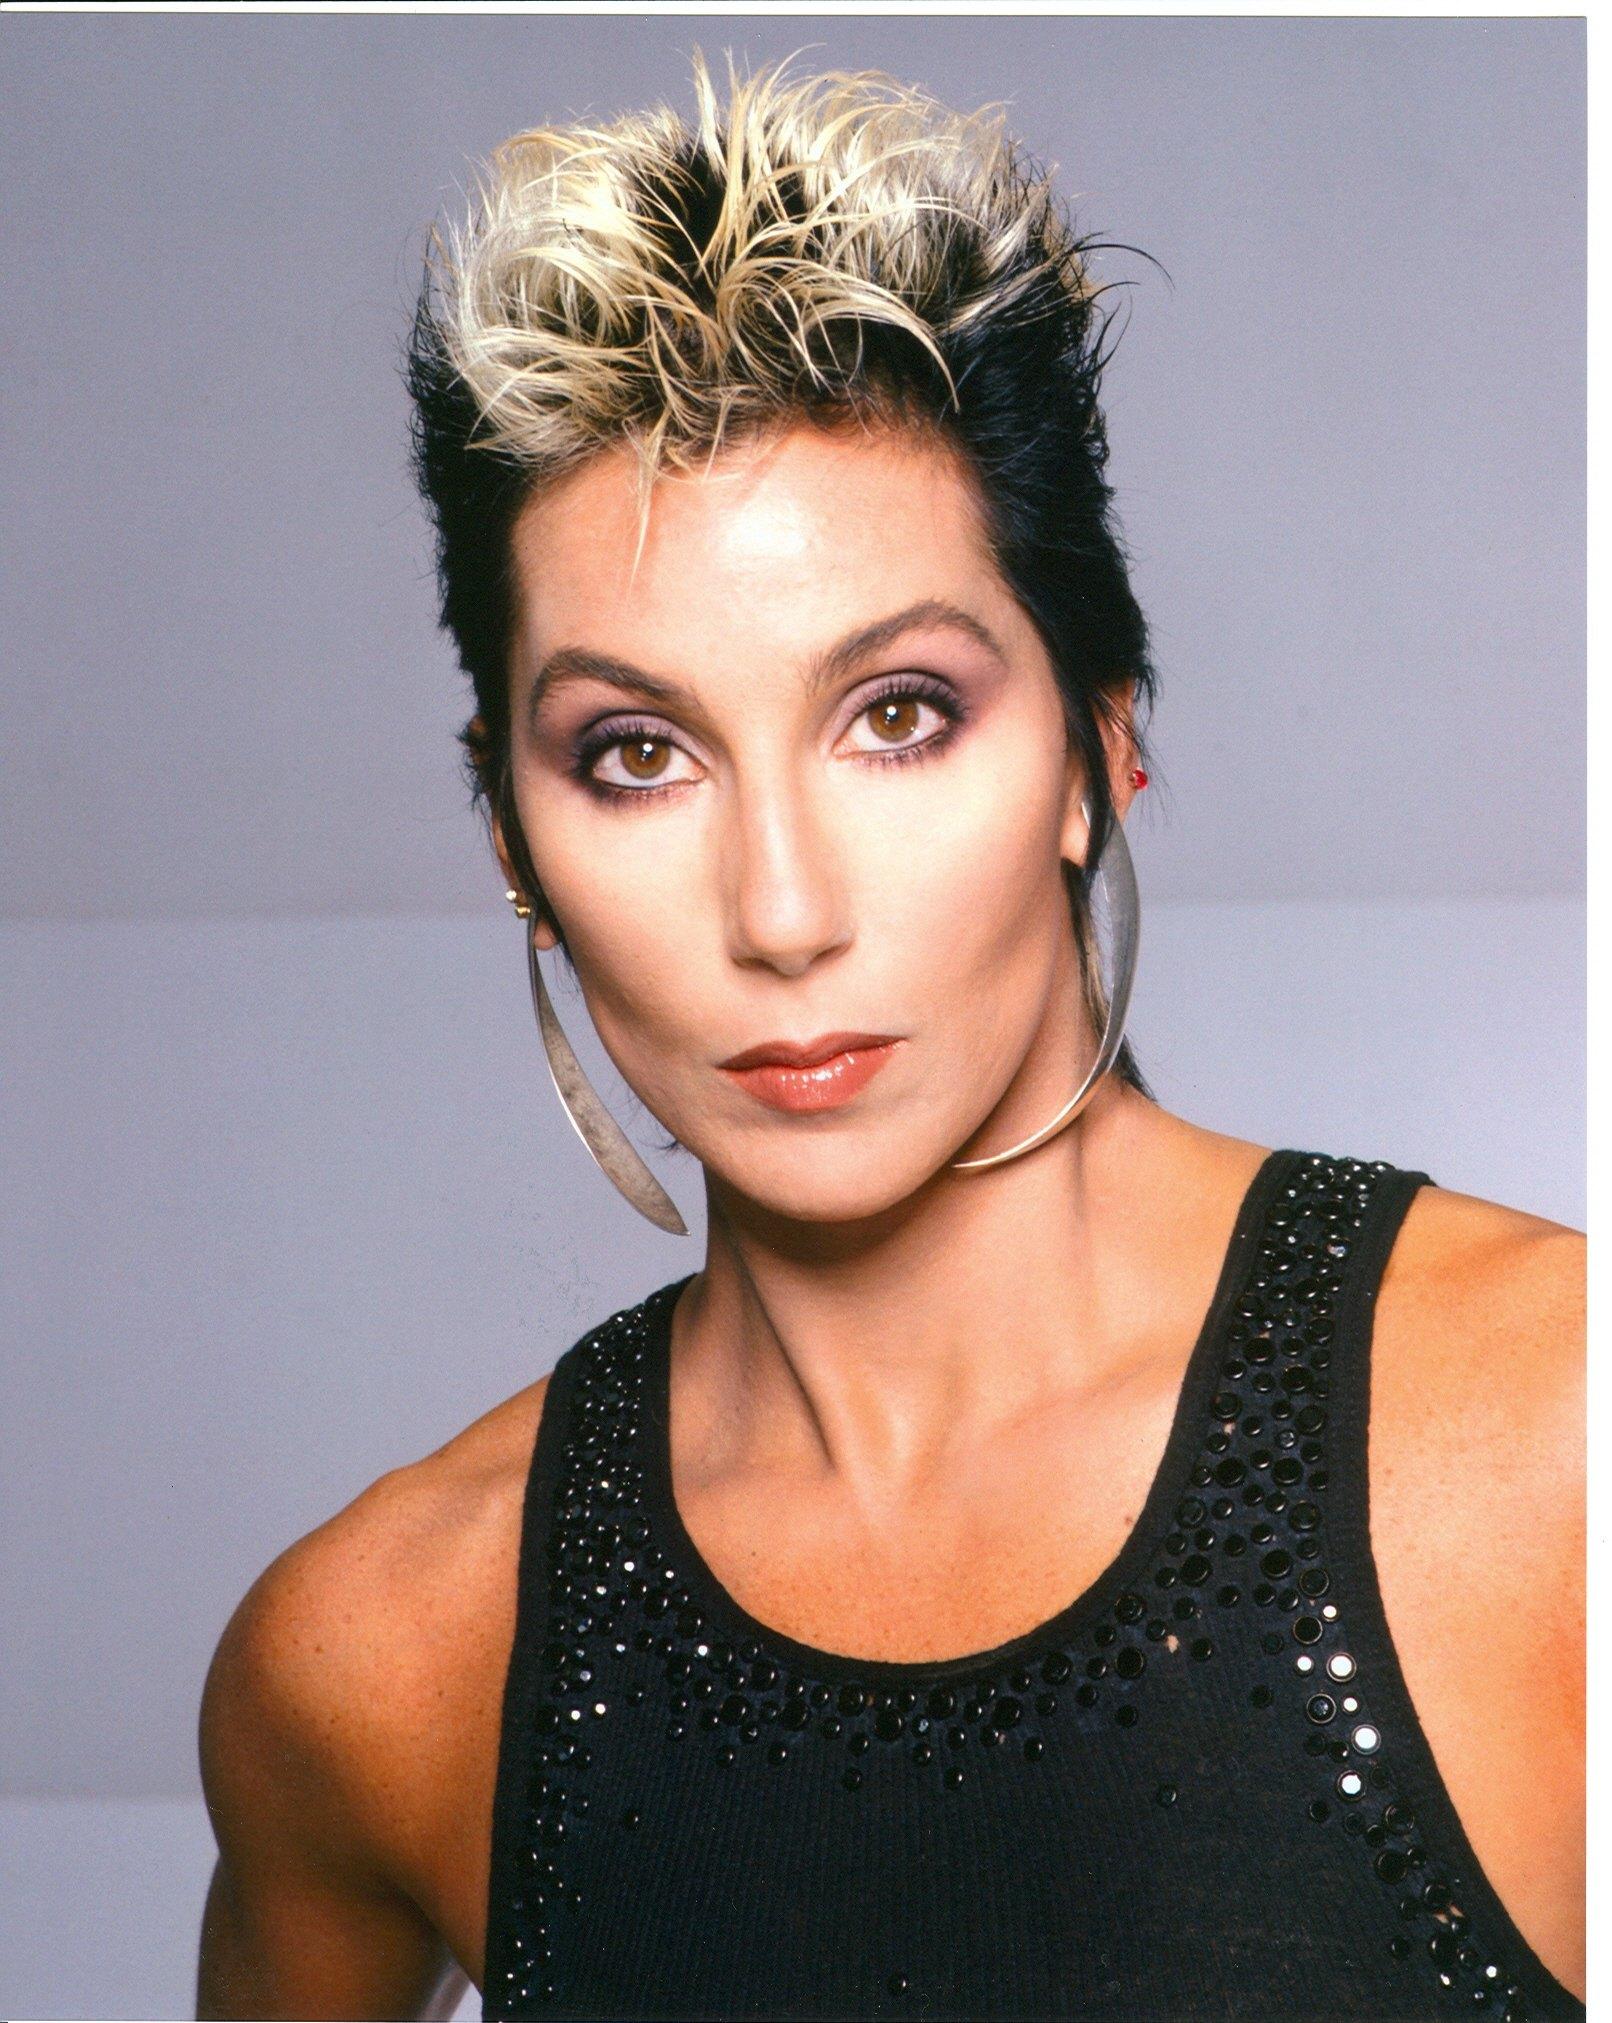 Kim kardashian hot tits